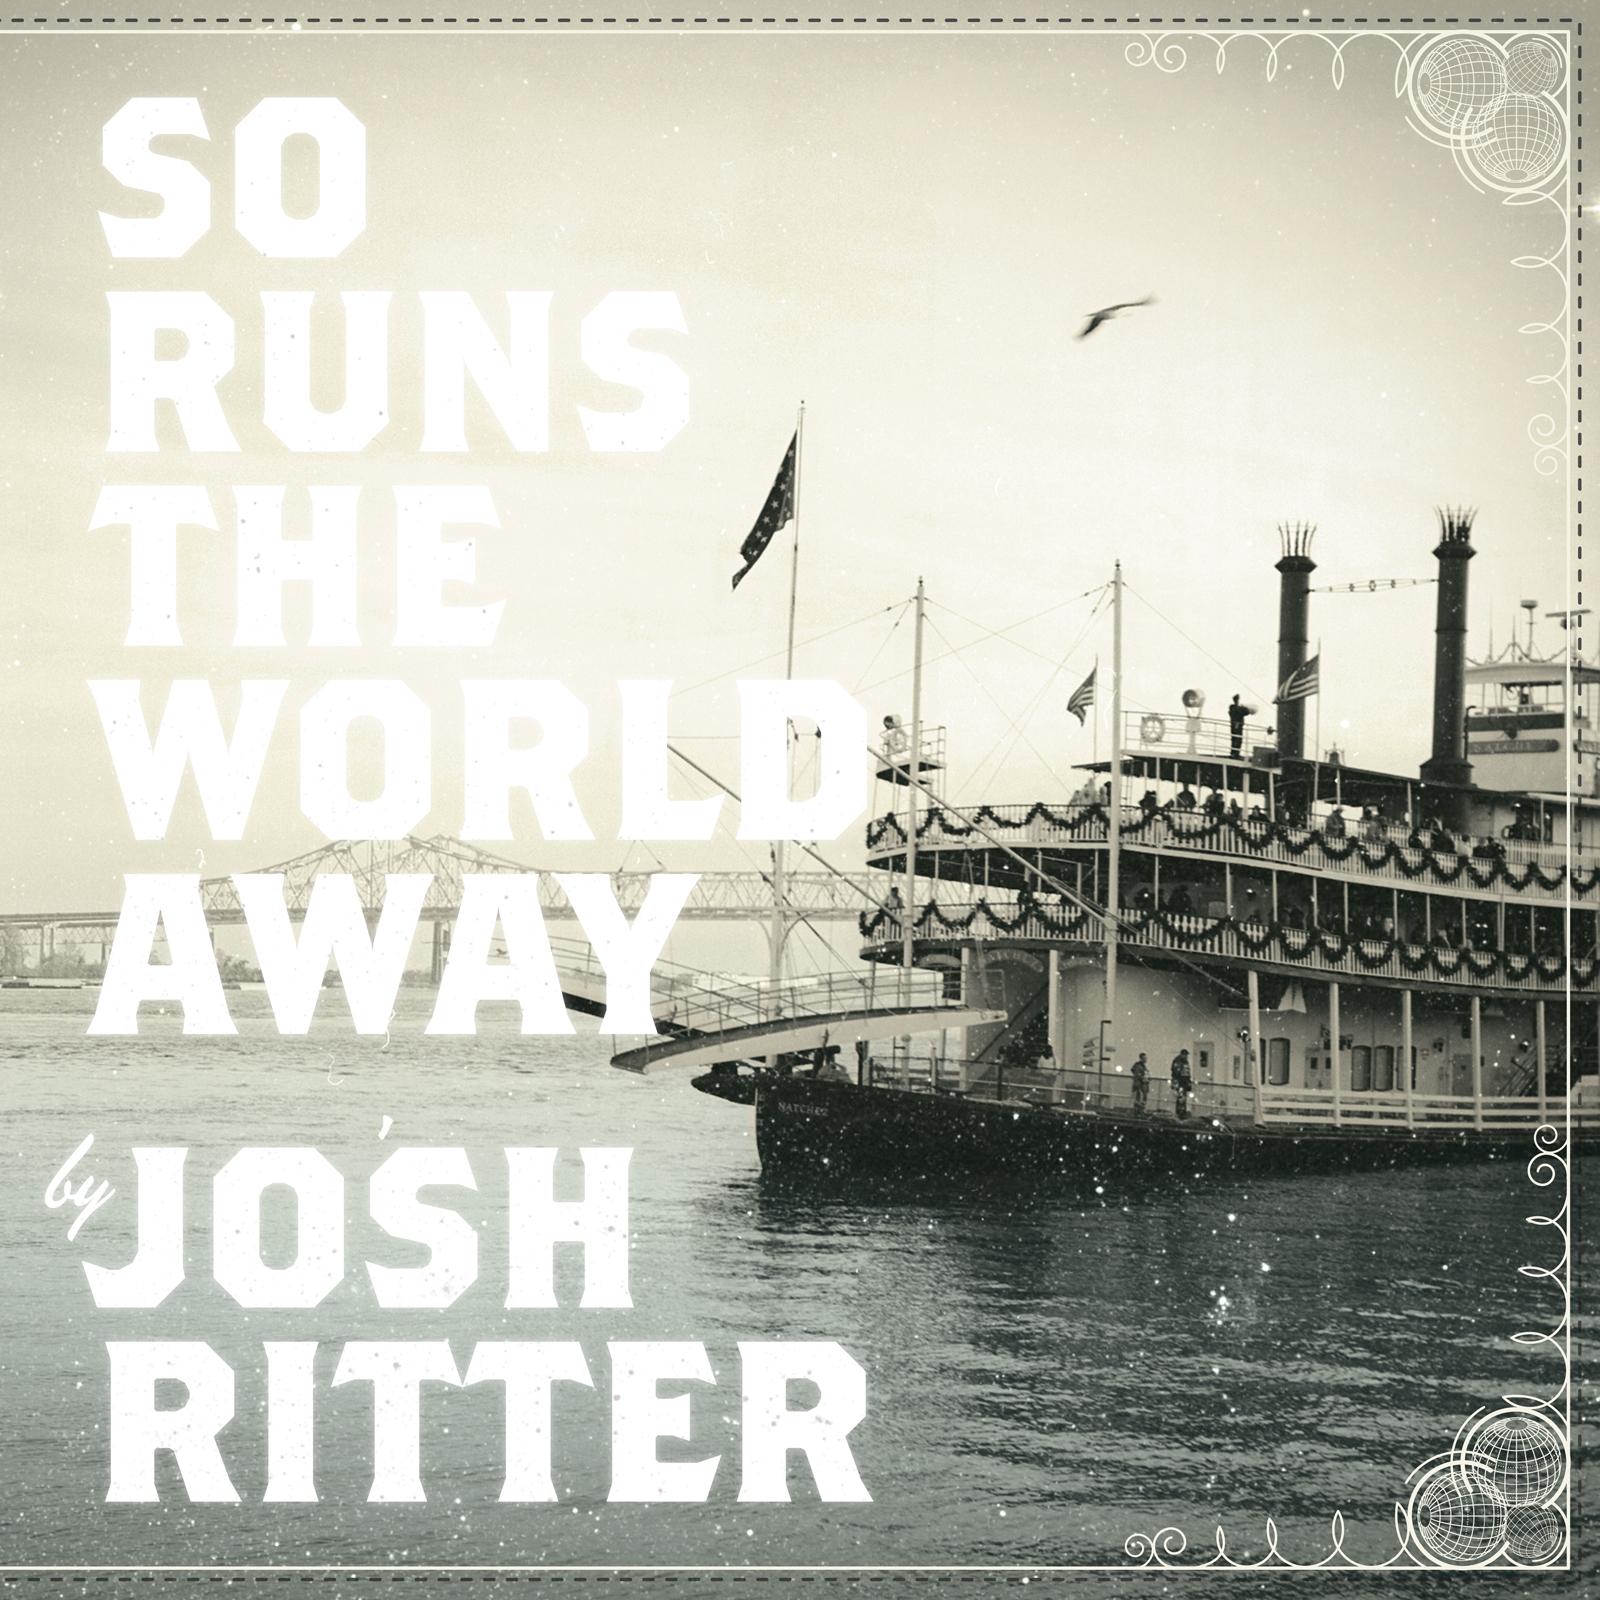 Josh_Ritter_-_So_Runs_The_World_Away_artwork